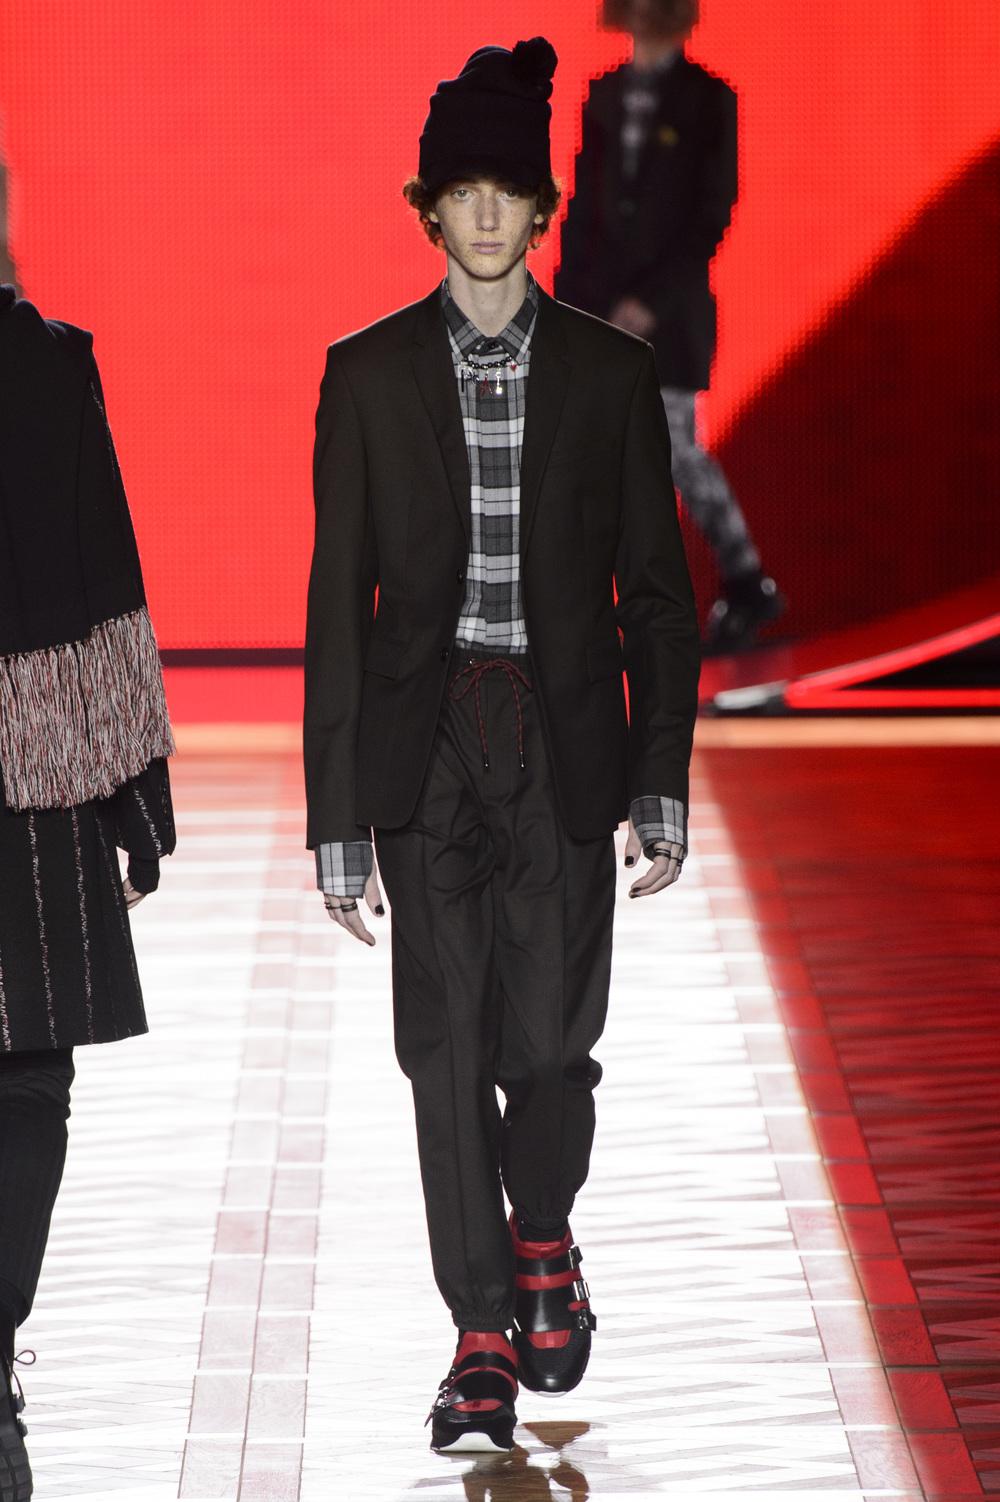 Dior_Homme_Hiver2016-17_look_35.JPG